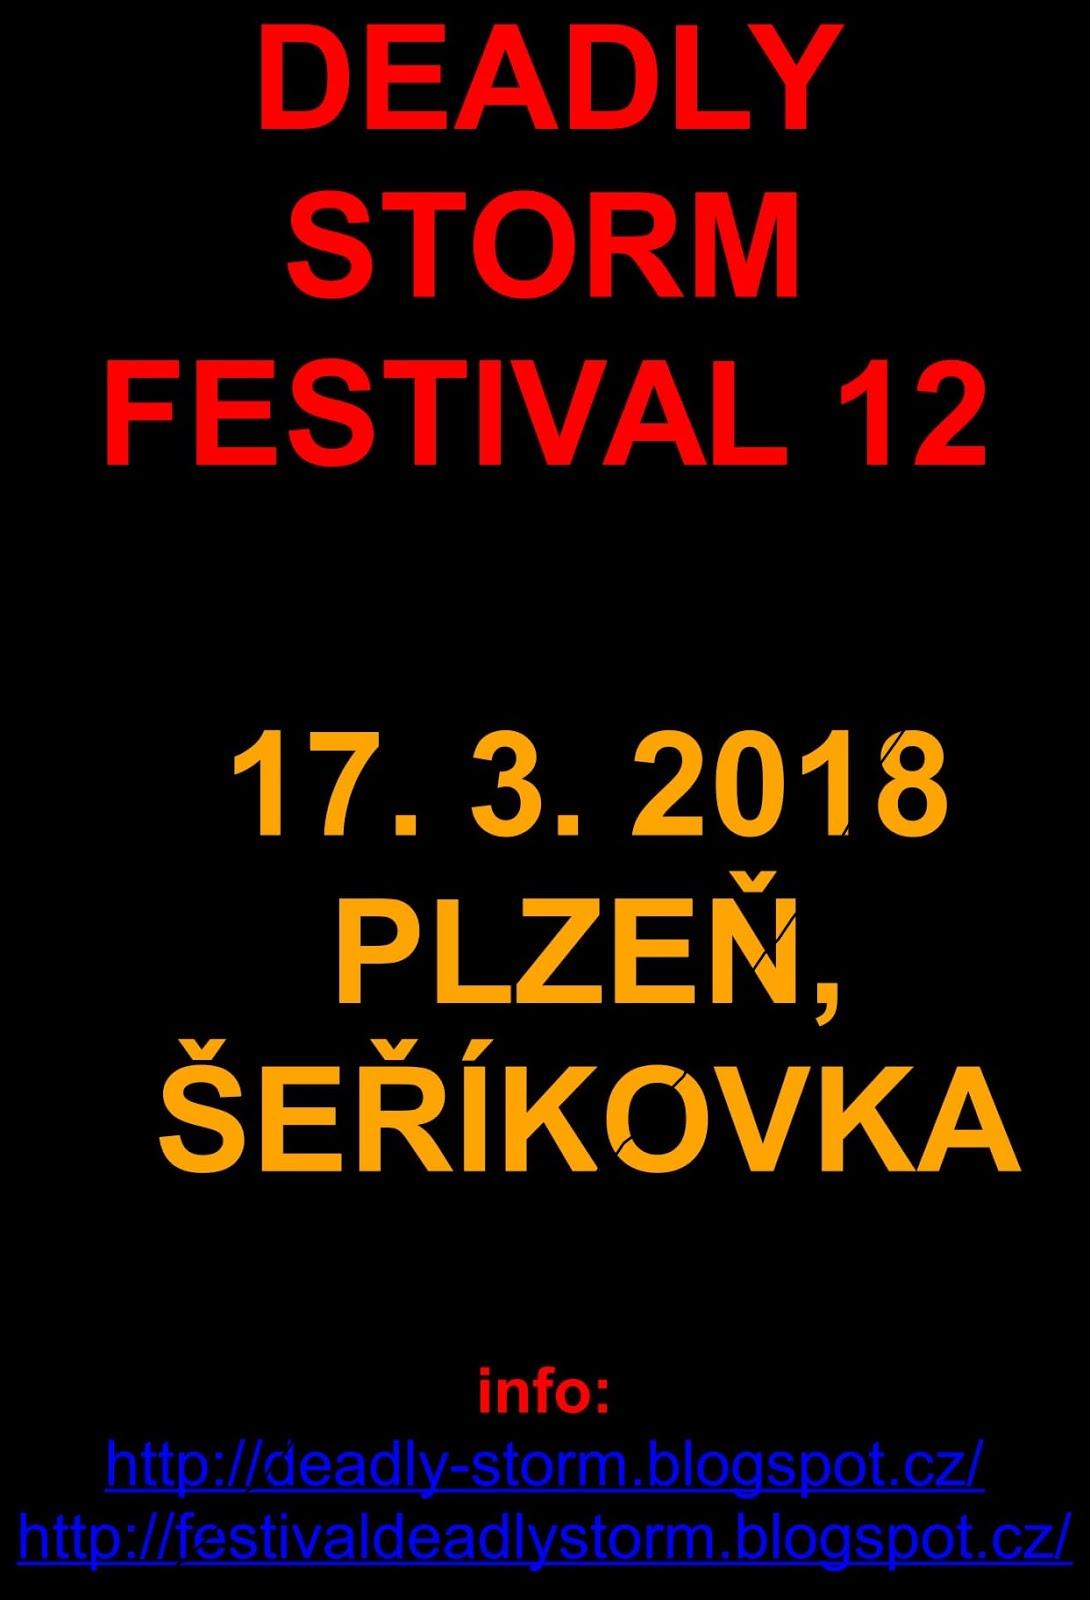 17. 3. 2018 - DEADLY STORM FESTIVAL 12, Plzeň - Šeříkovka